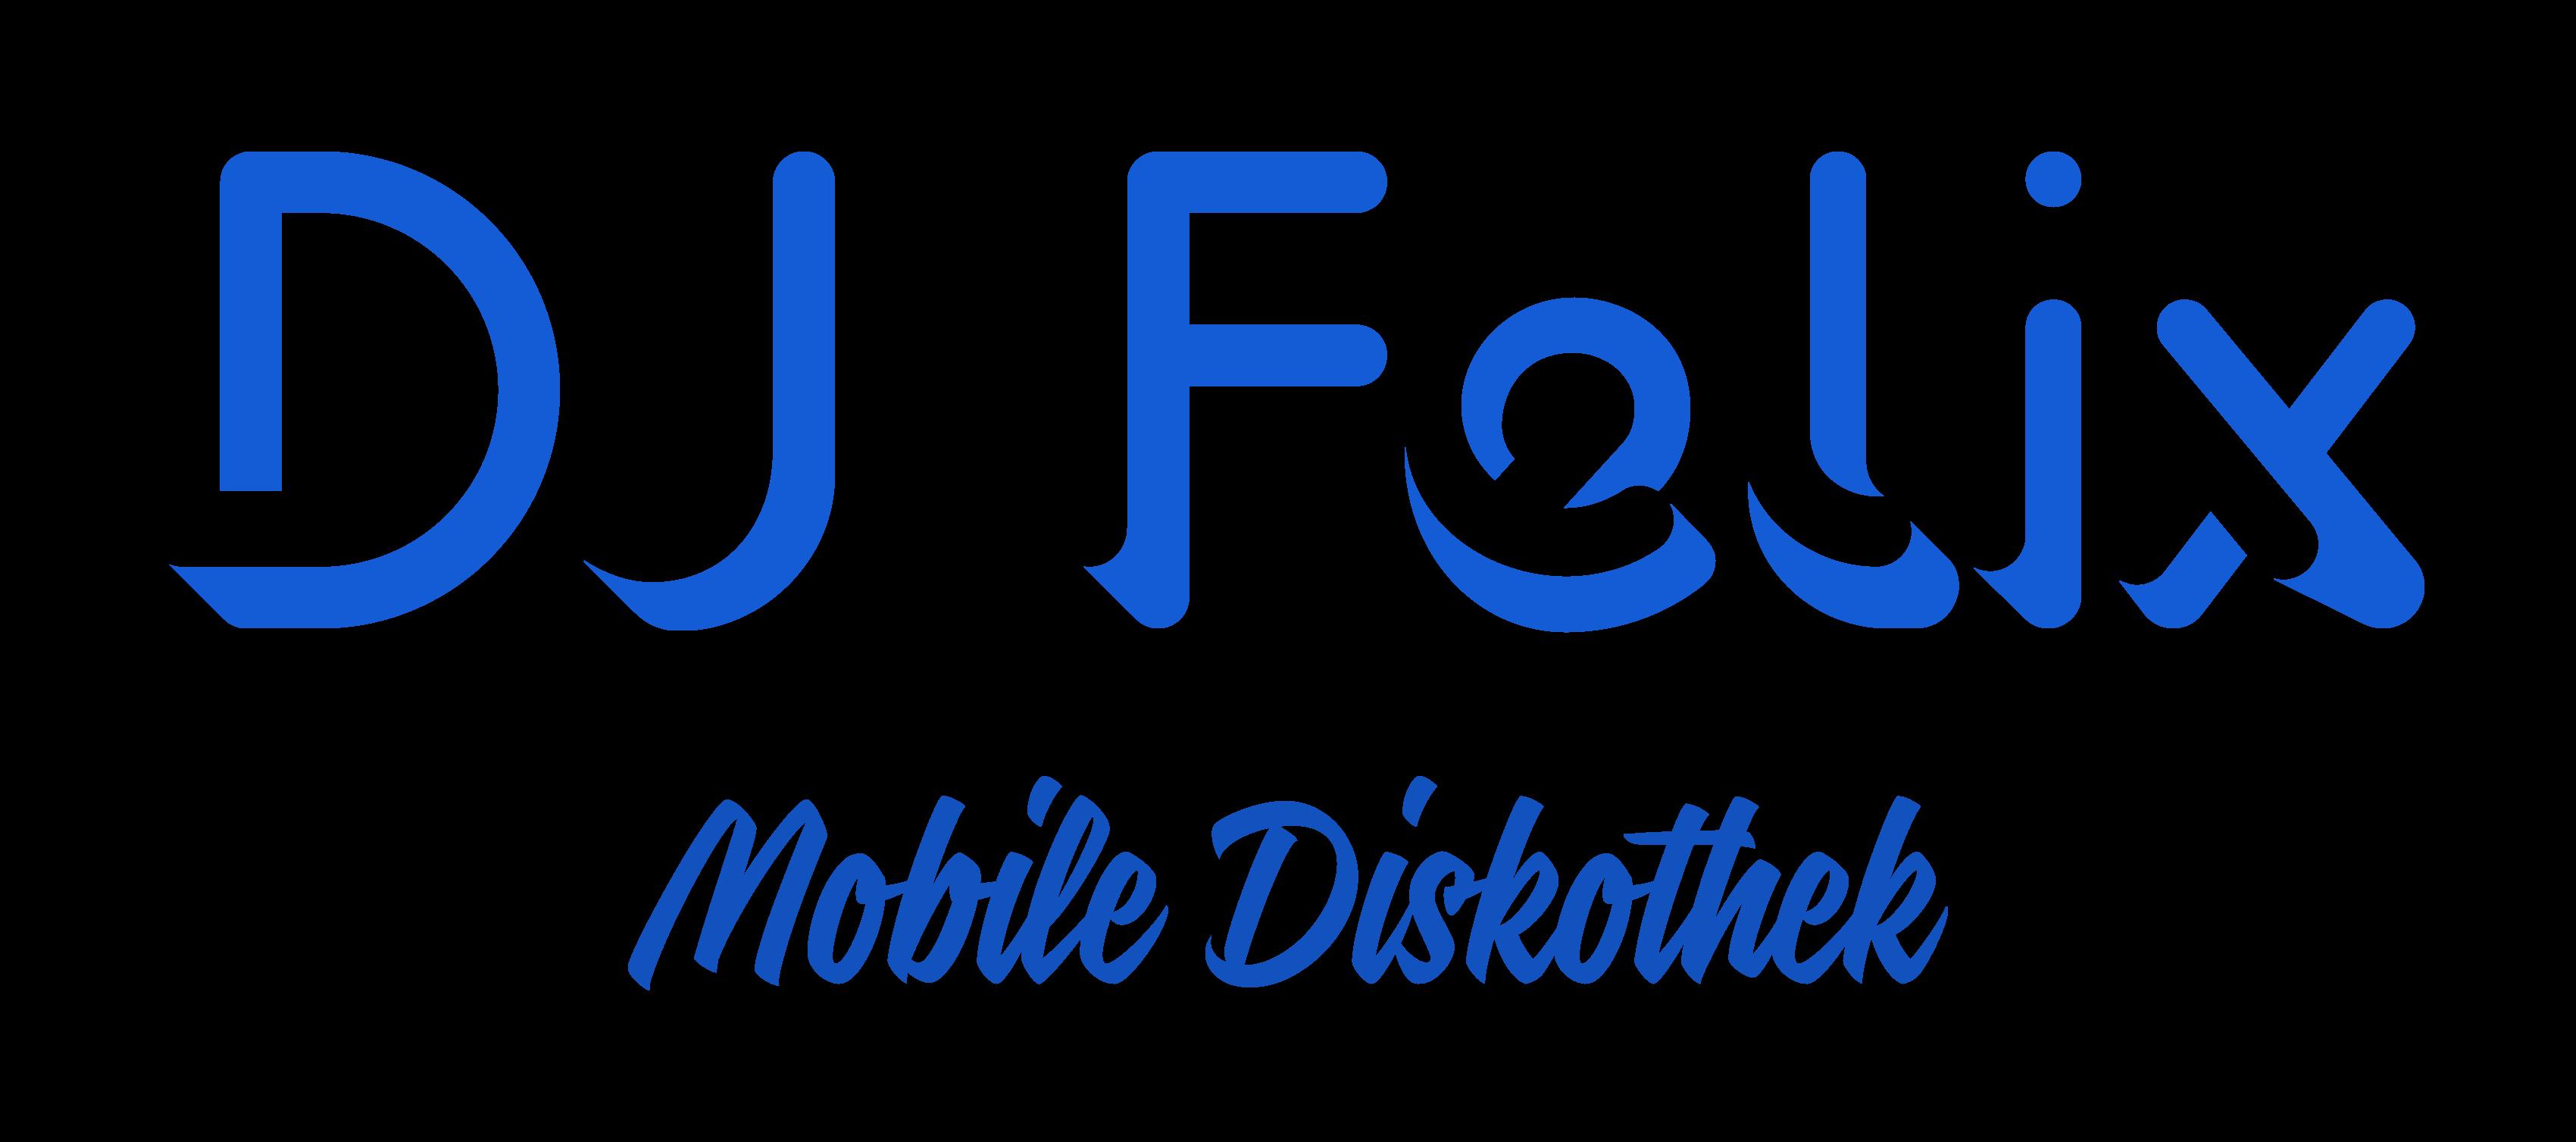 Mobile Diskothek Felix Bitterlich